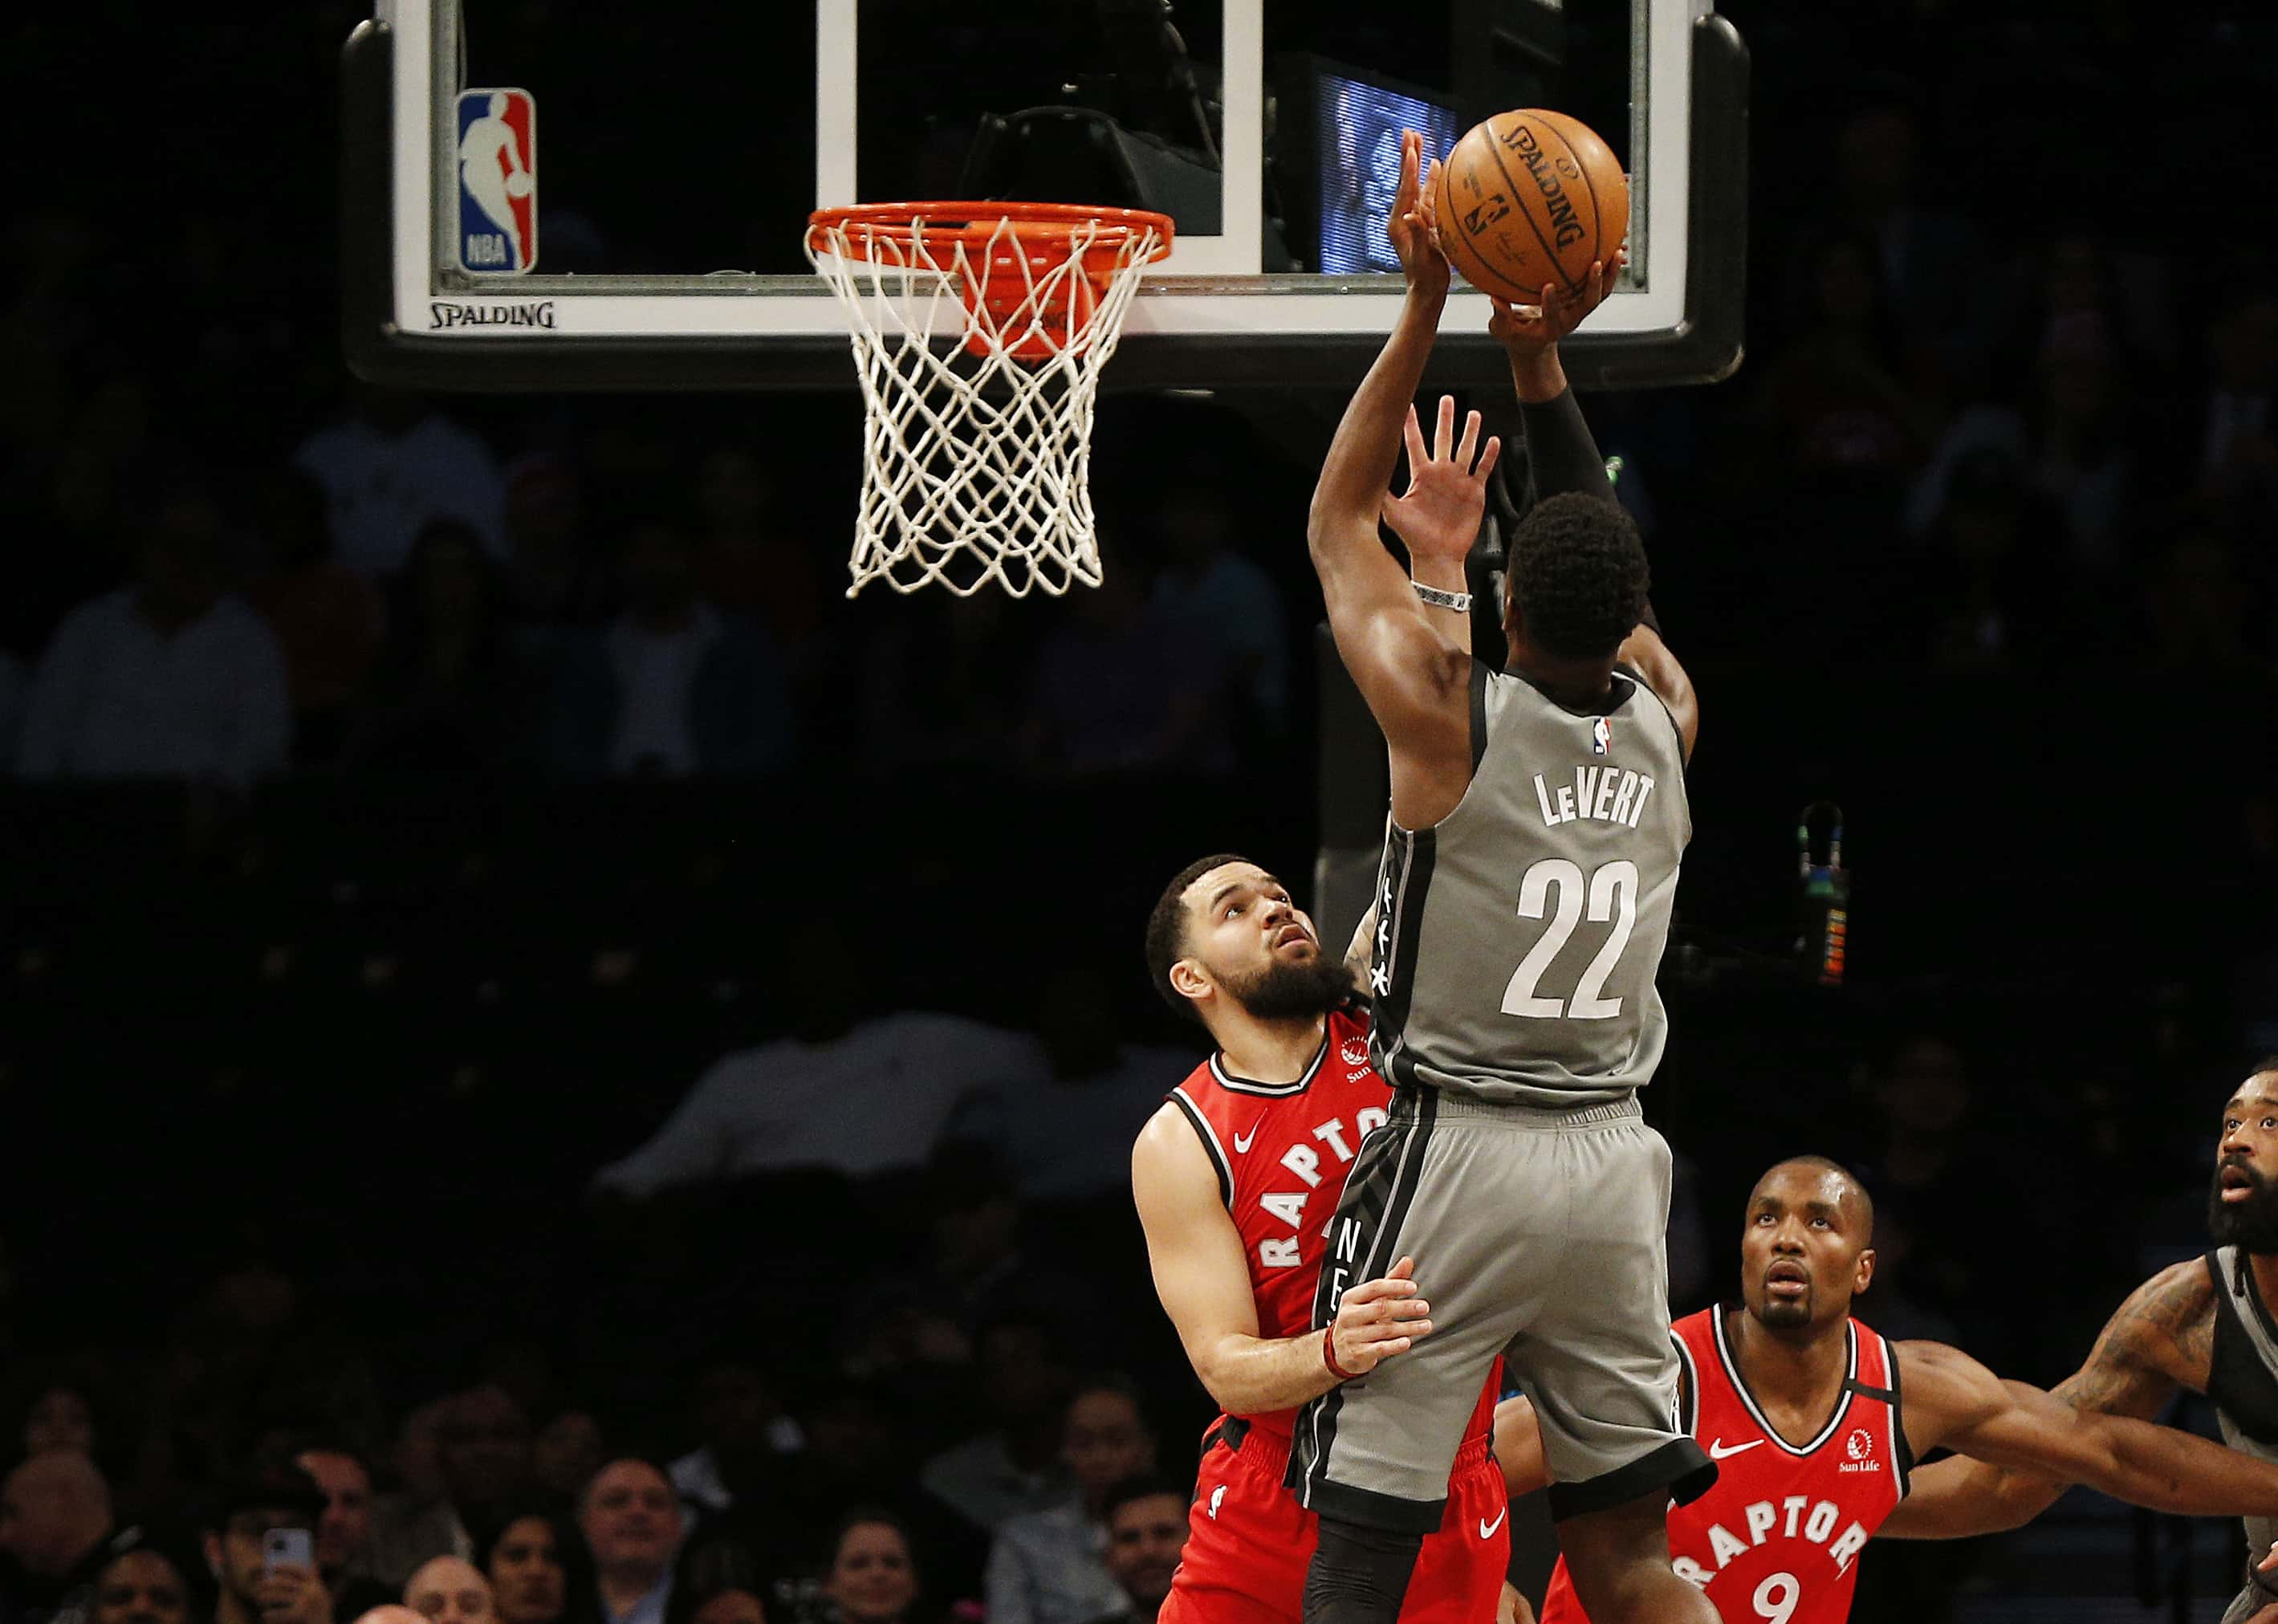 Feb 12, 2020; Brooklyn, New York, USA; Brooklyn Nets guard Caris LeVert (22) shoots over Toronto Raptors guard Fred VanVleet (23) during the first half at Barclays Center. Mandatory Credit: Andy Marlin-USA TODAY Sports